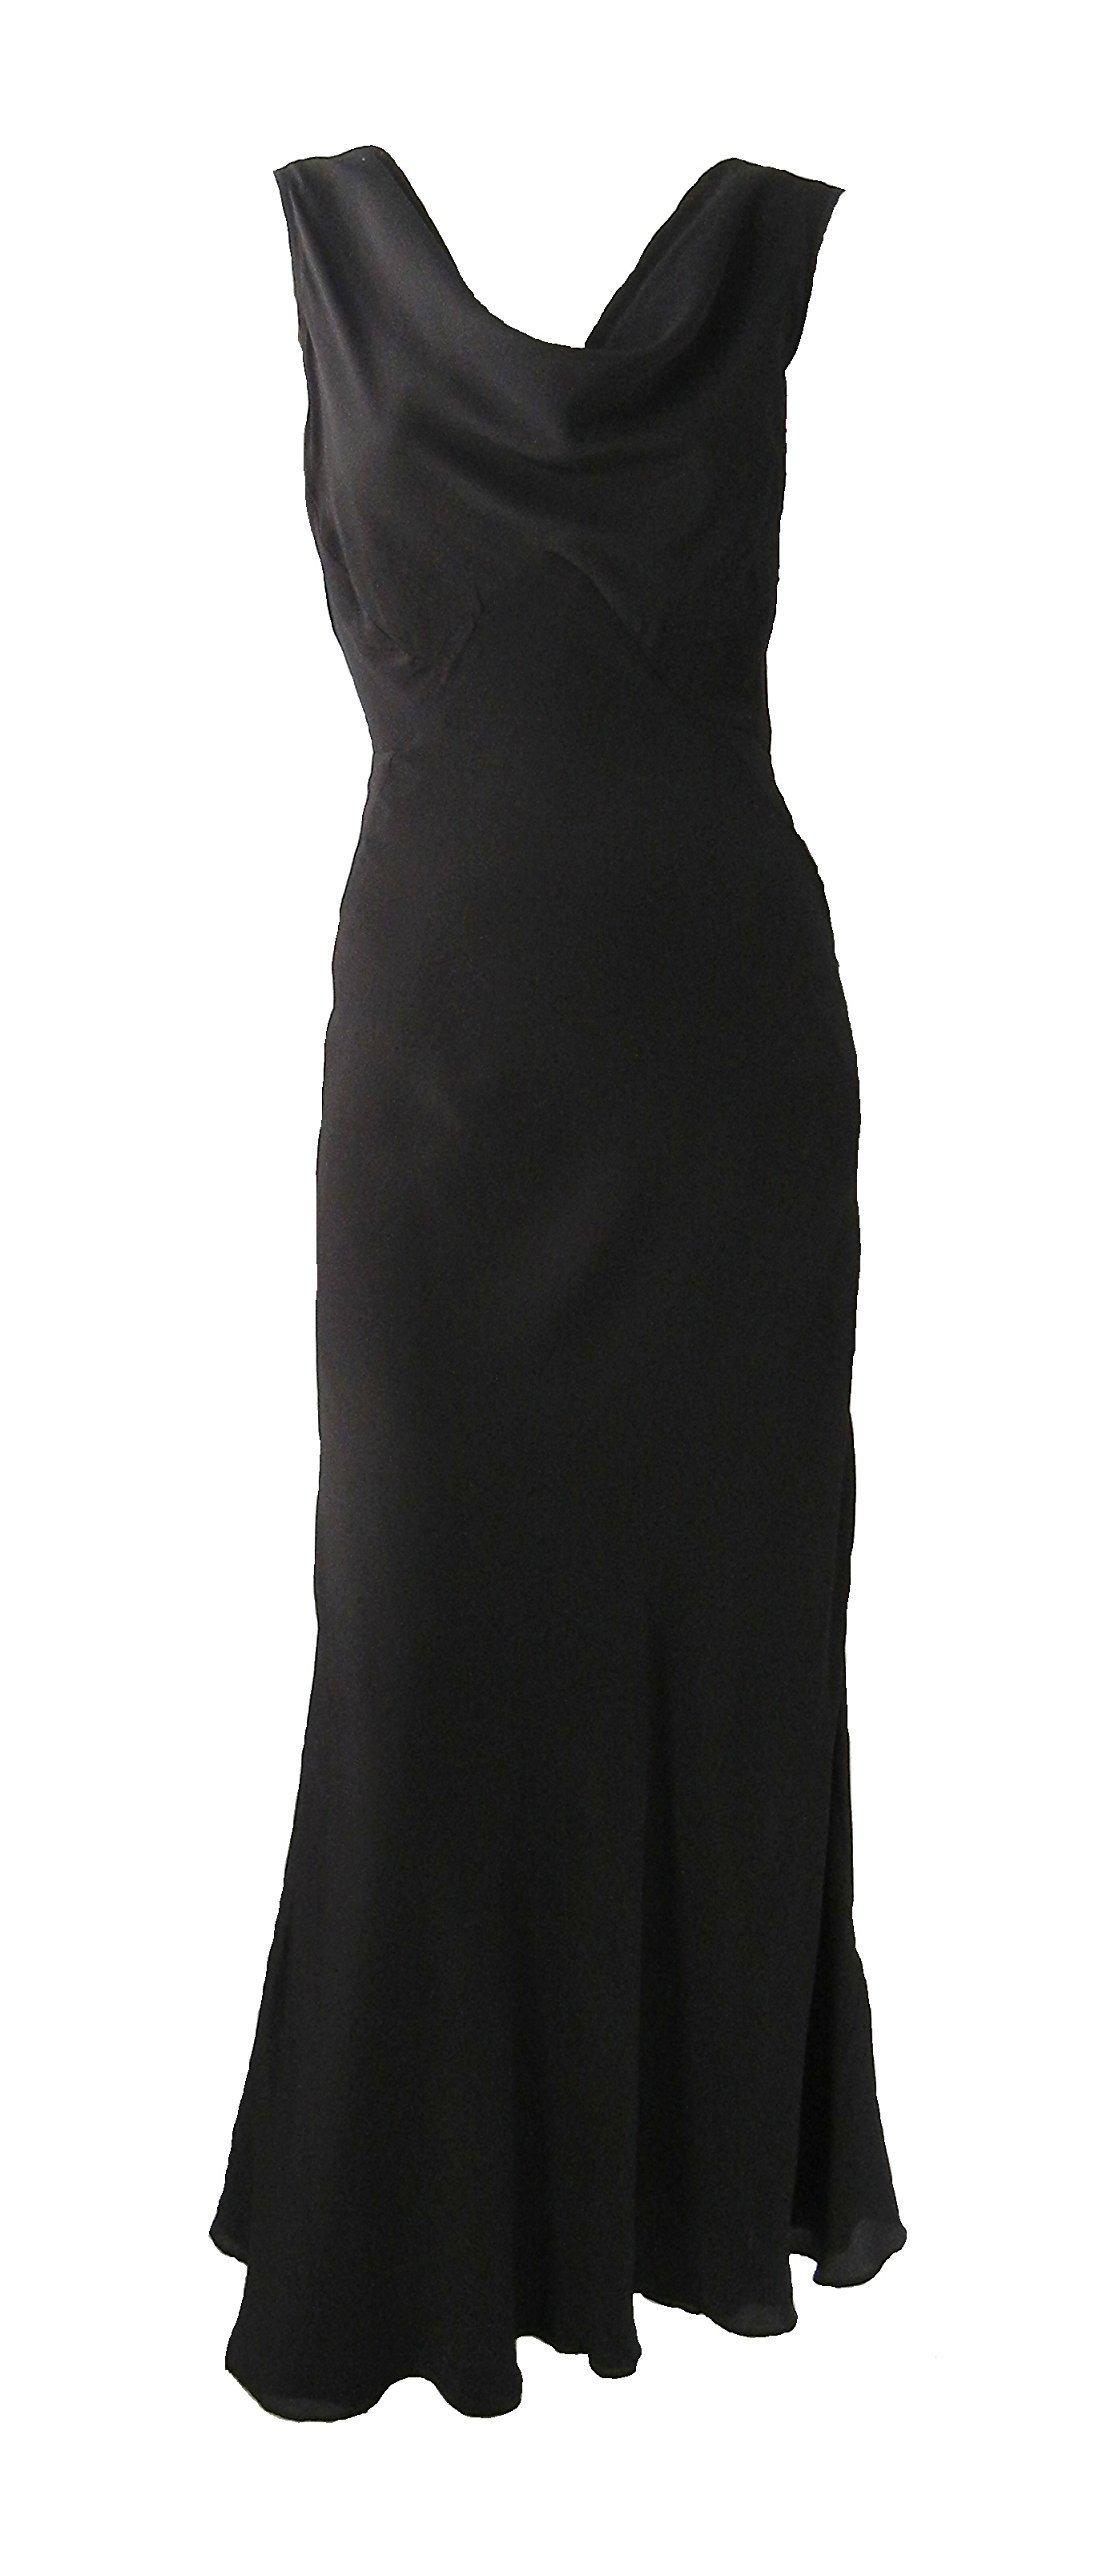 Vintage 1930s Style Black Silk Gown